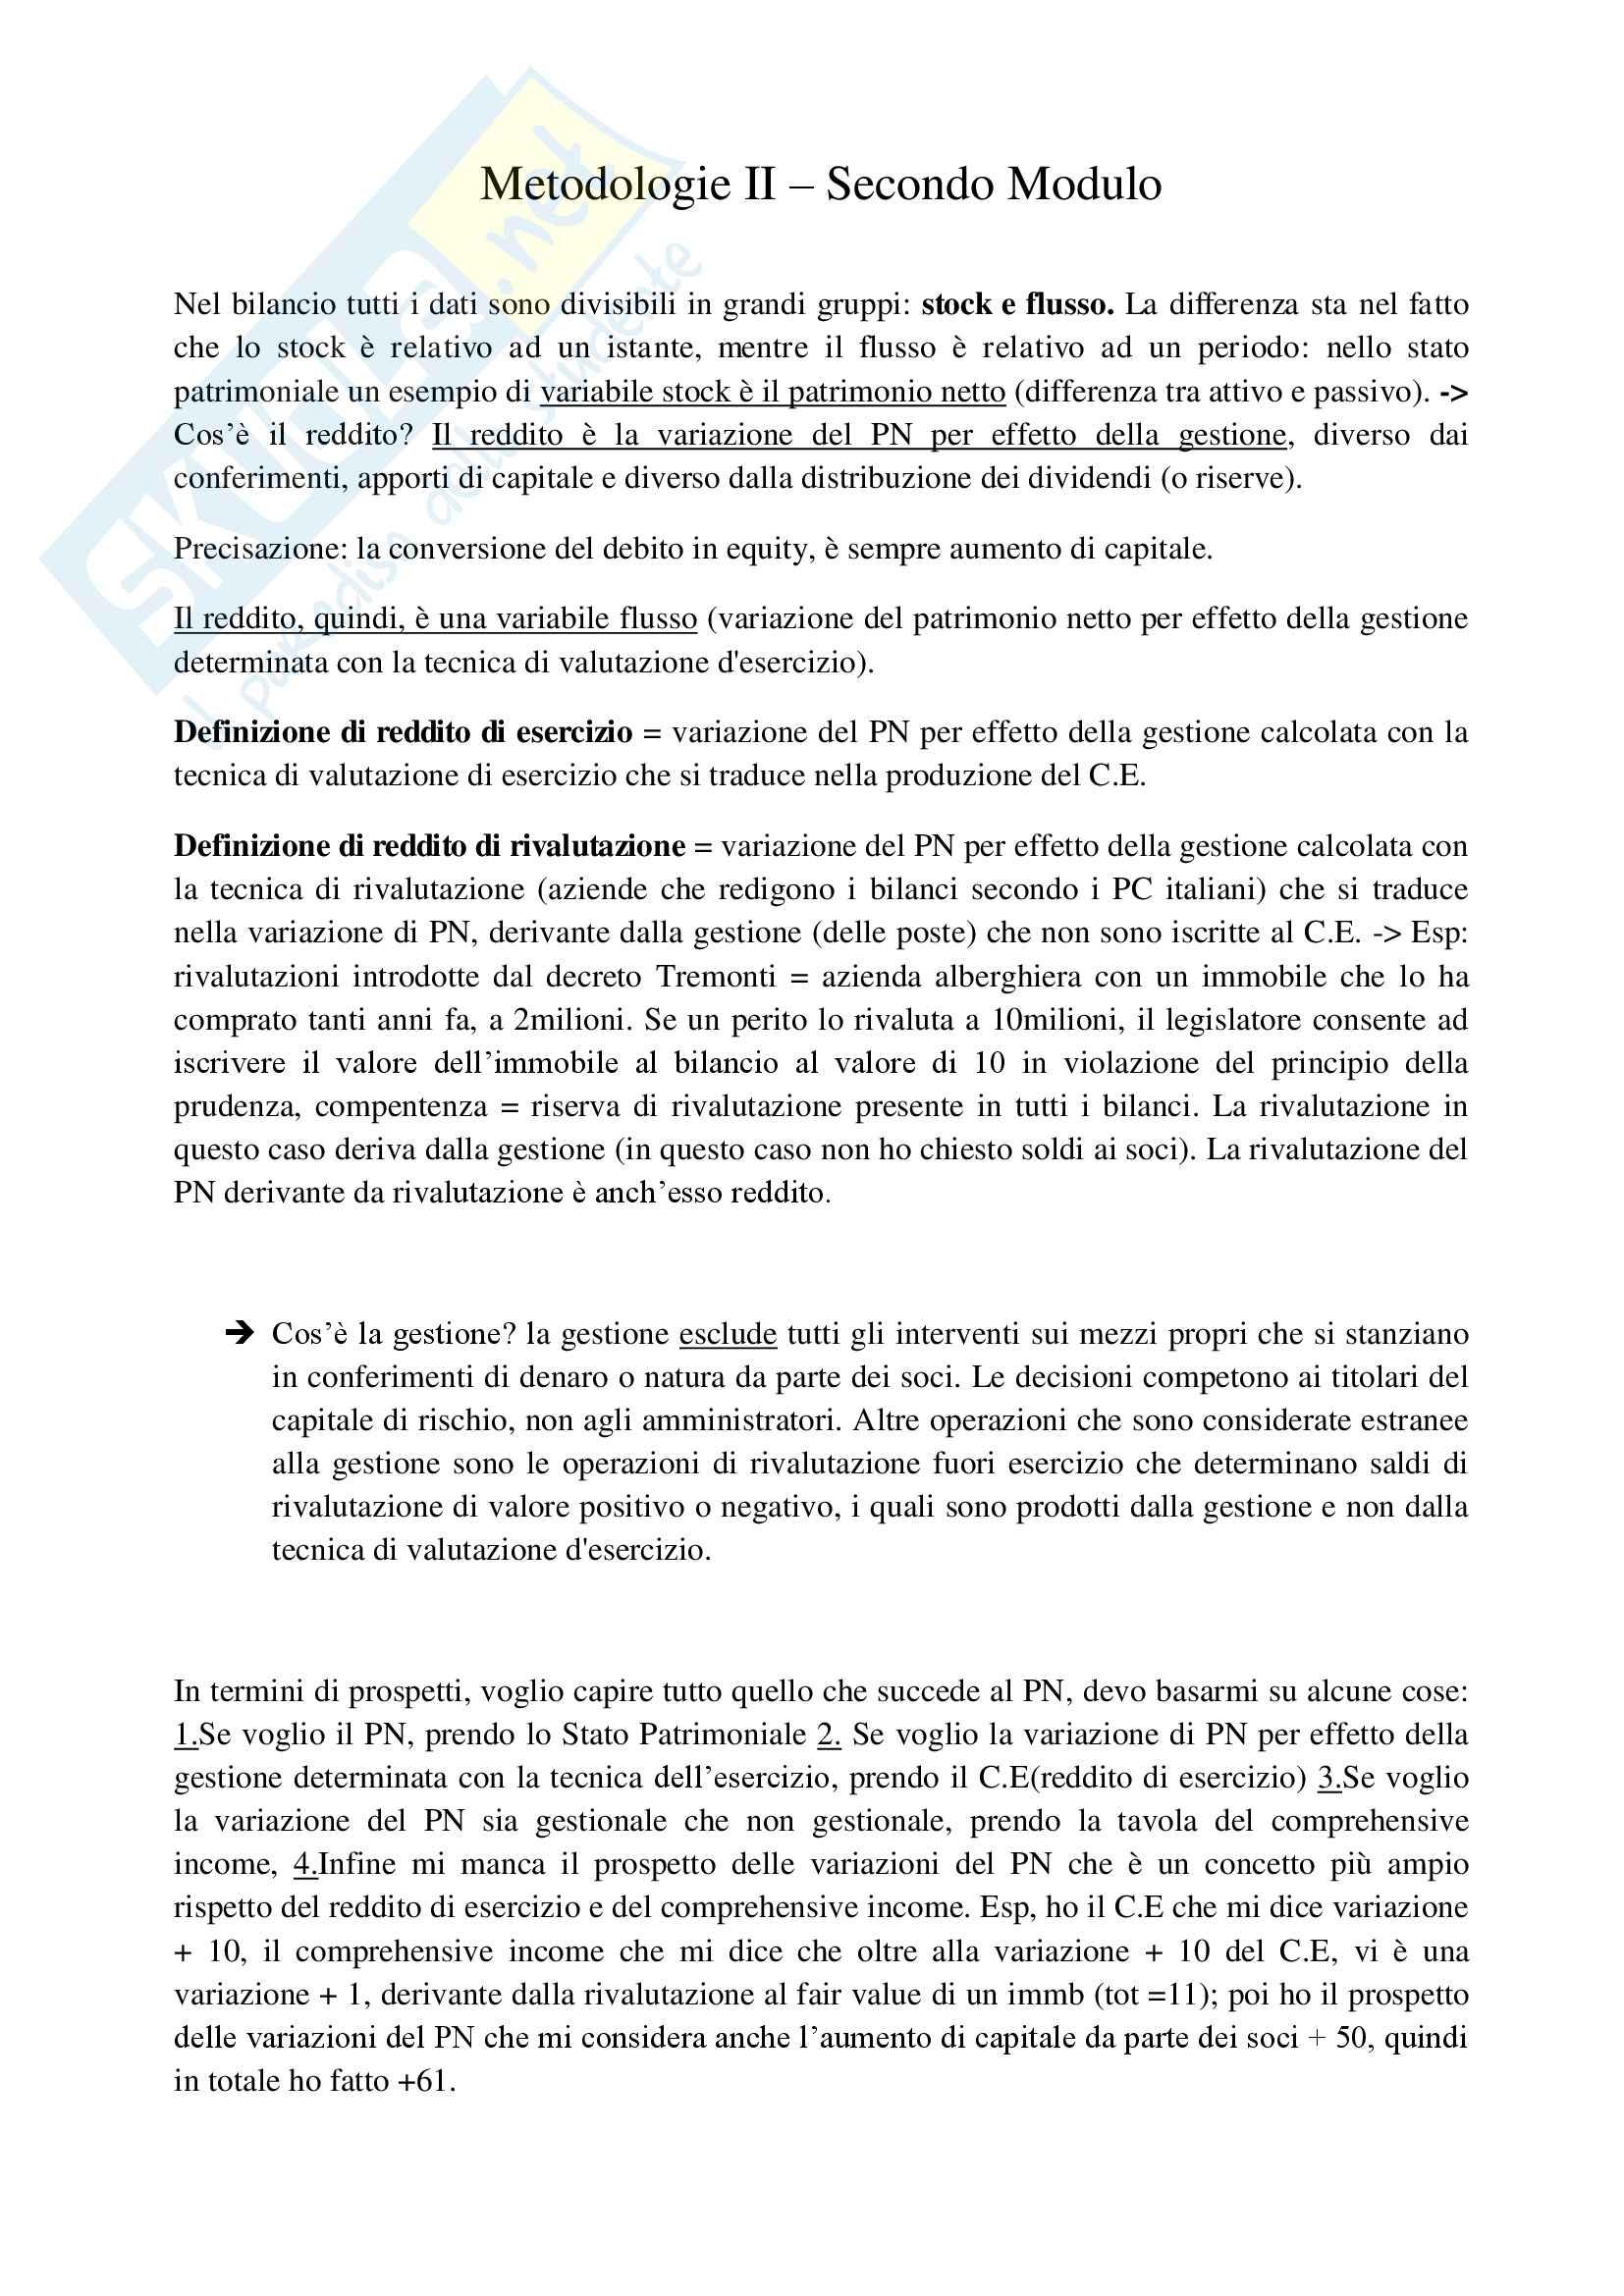 Analisi di bilancio - Metodologie II